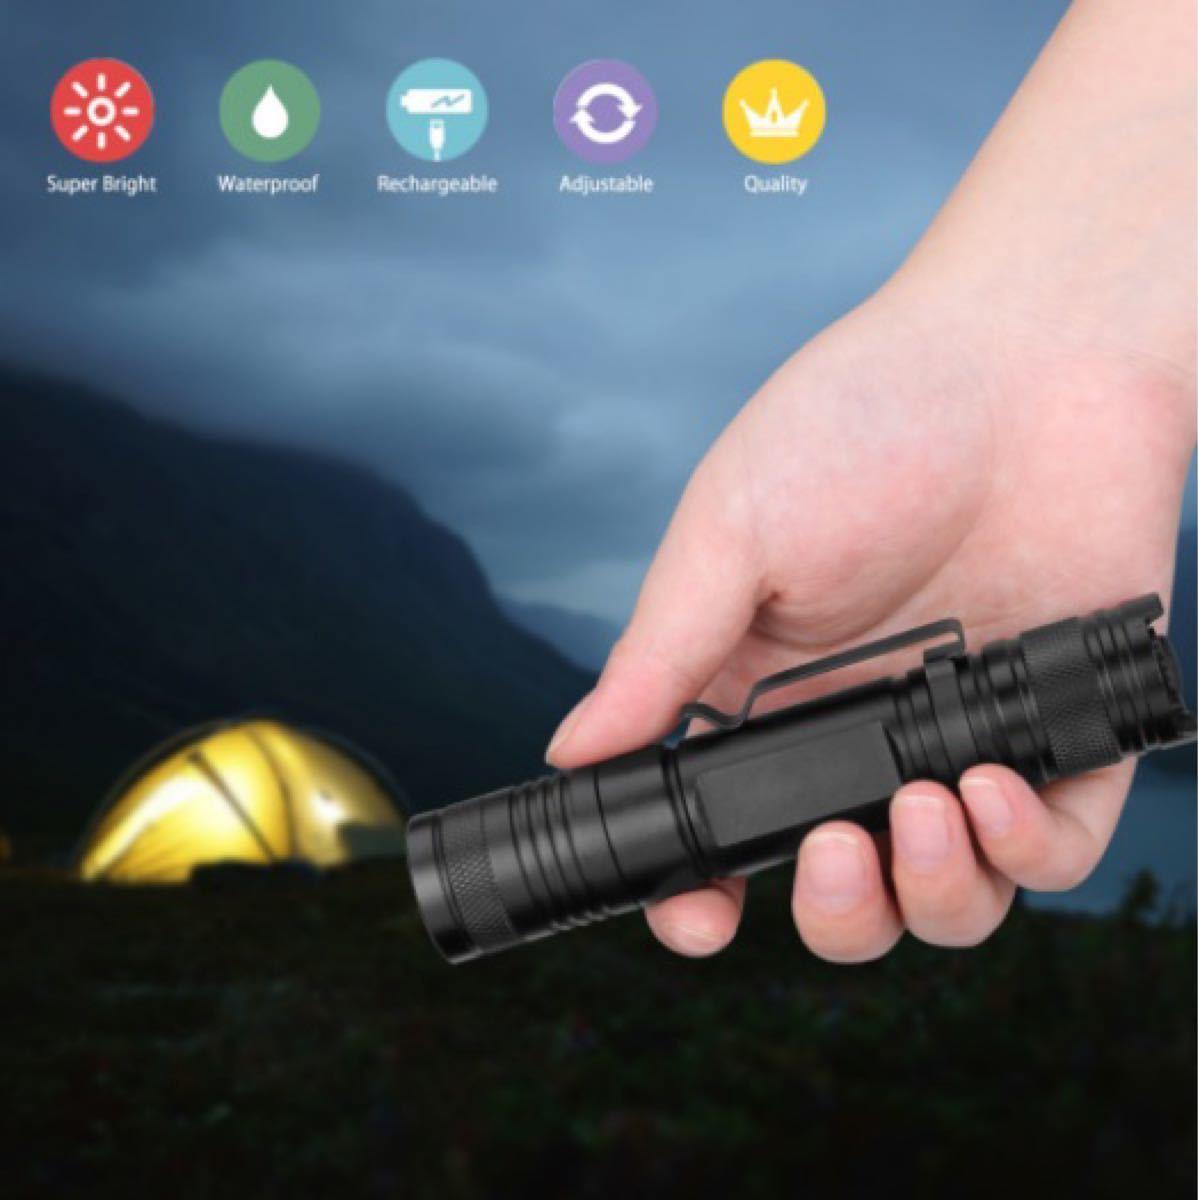 ★USBケーブル付き懐中電灯 led USB充電式 強力XML-T6 防水IPX4